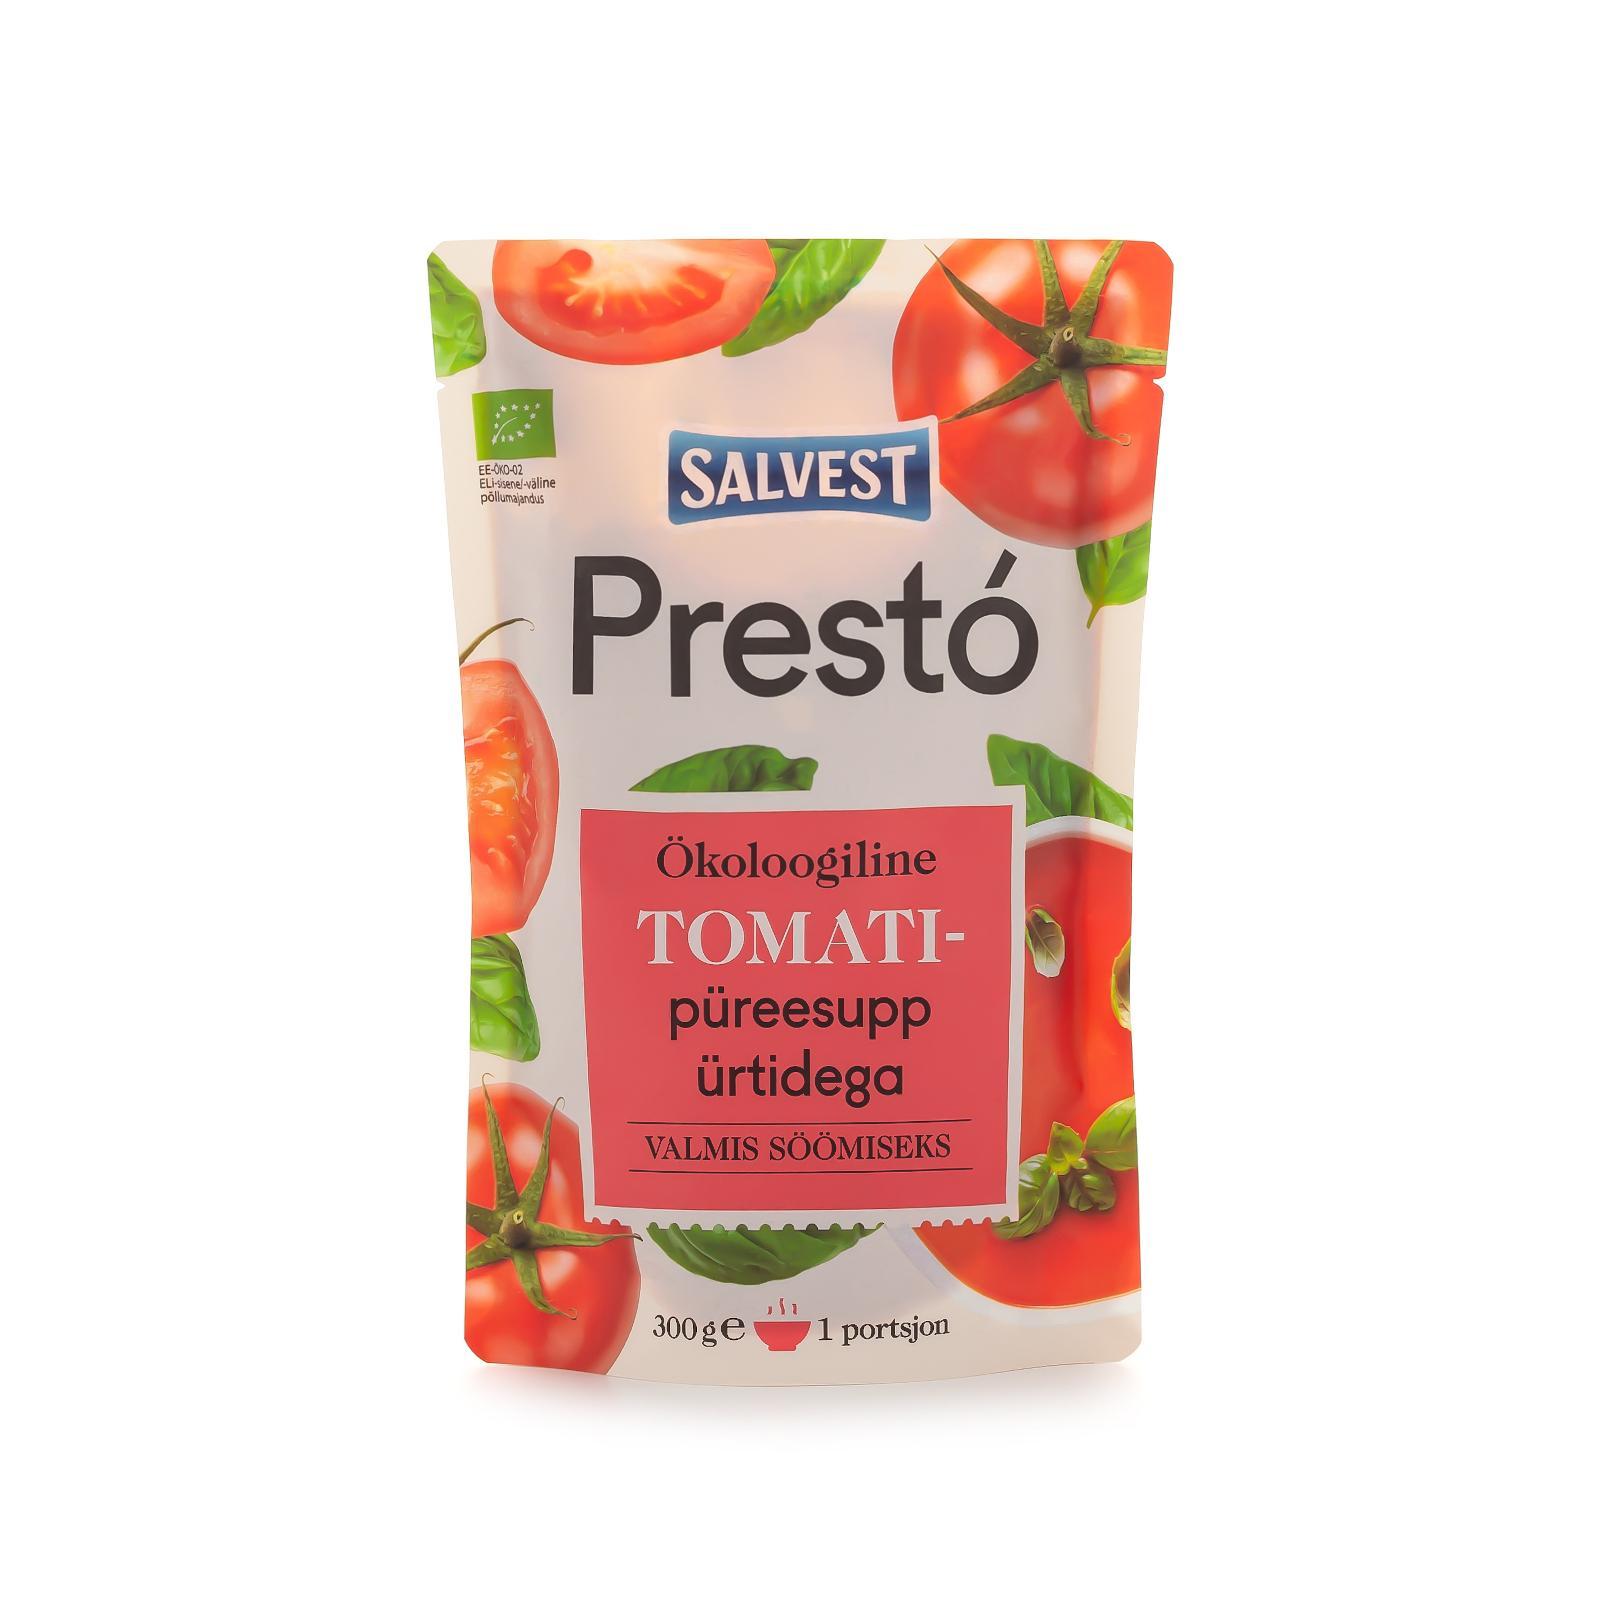 Salvest Prestó BIO Rajská polévka s bylinkami 300 g